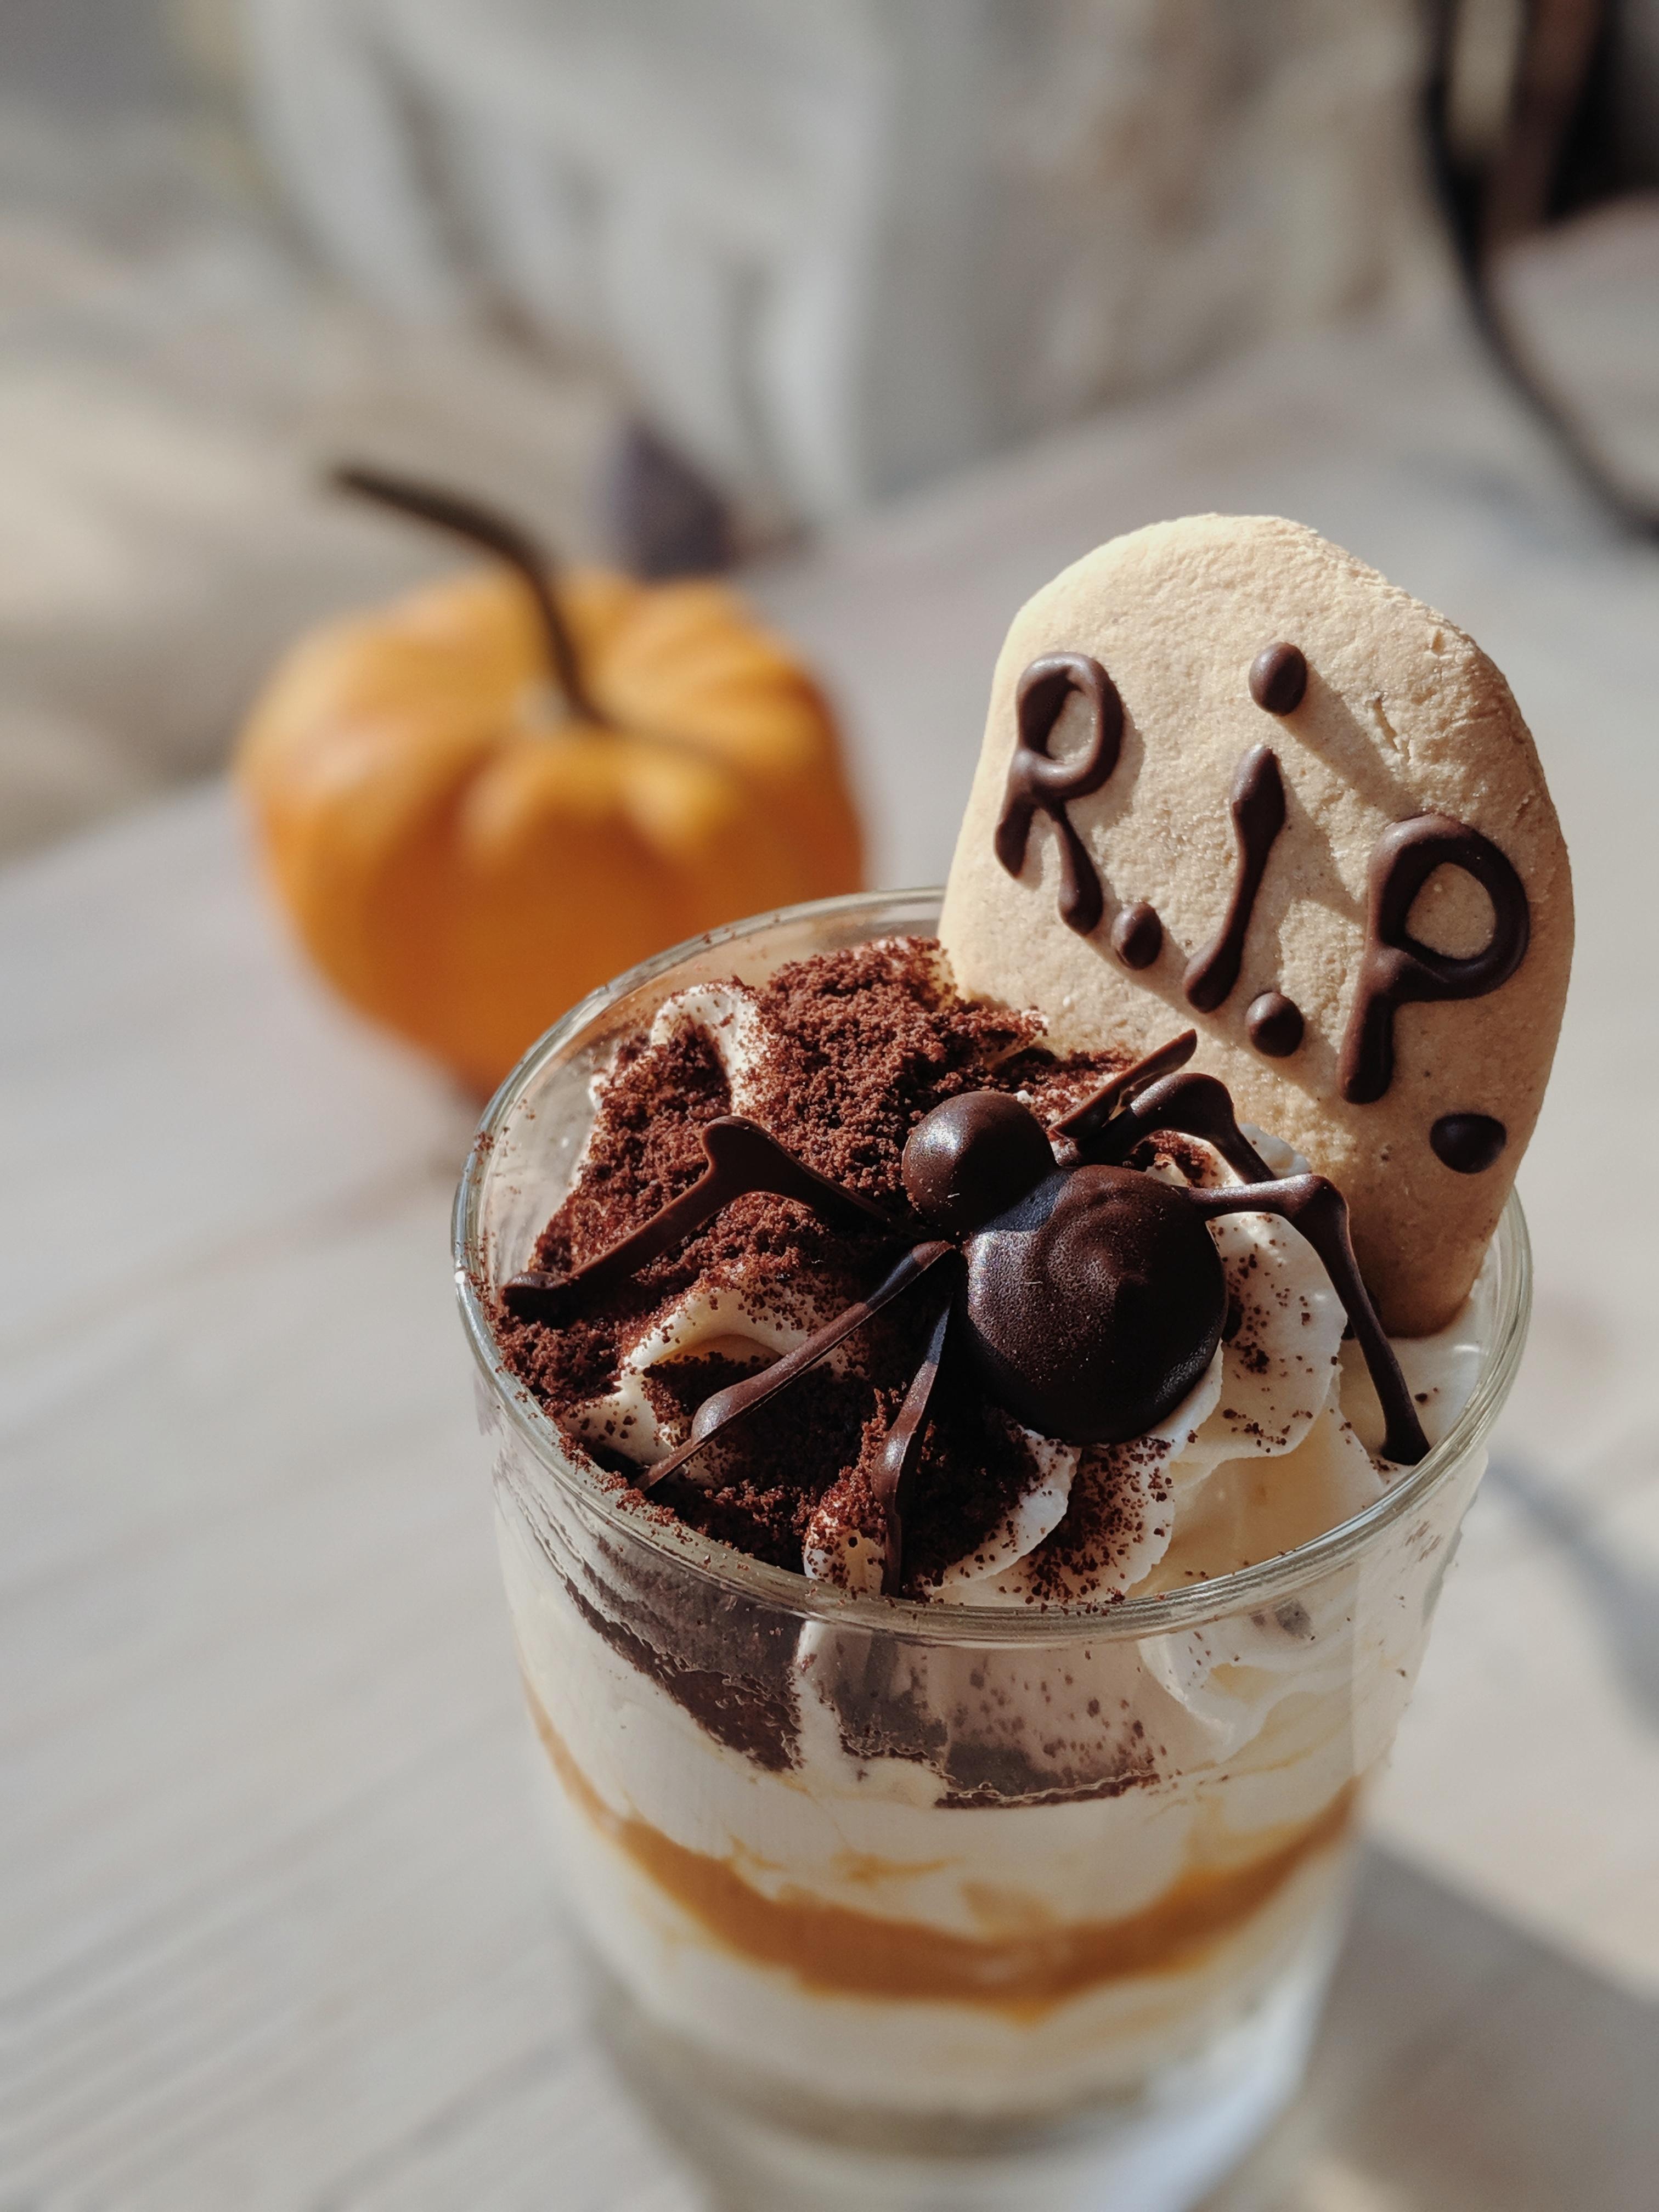 Halloween Theme Cup of Ice Cream